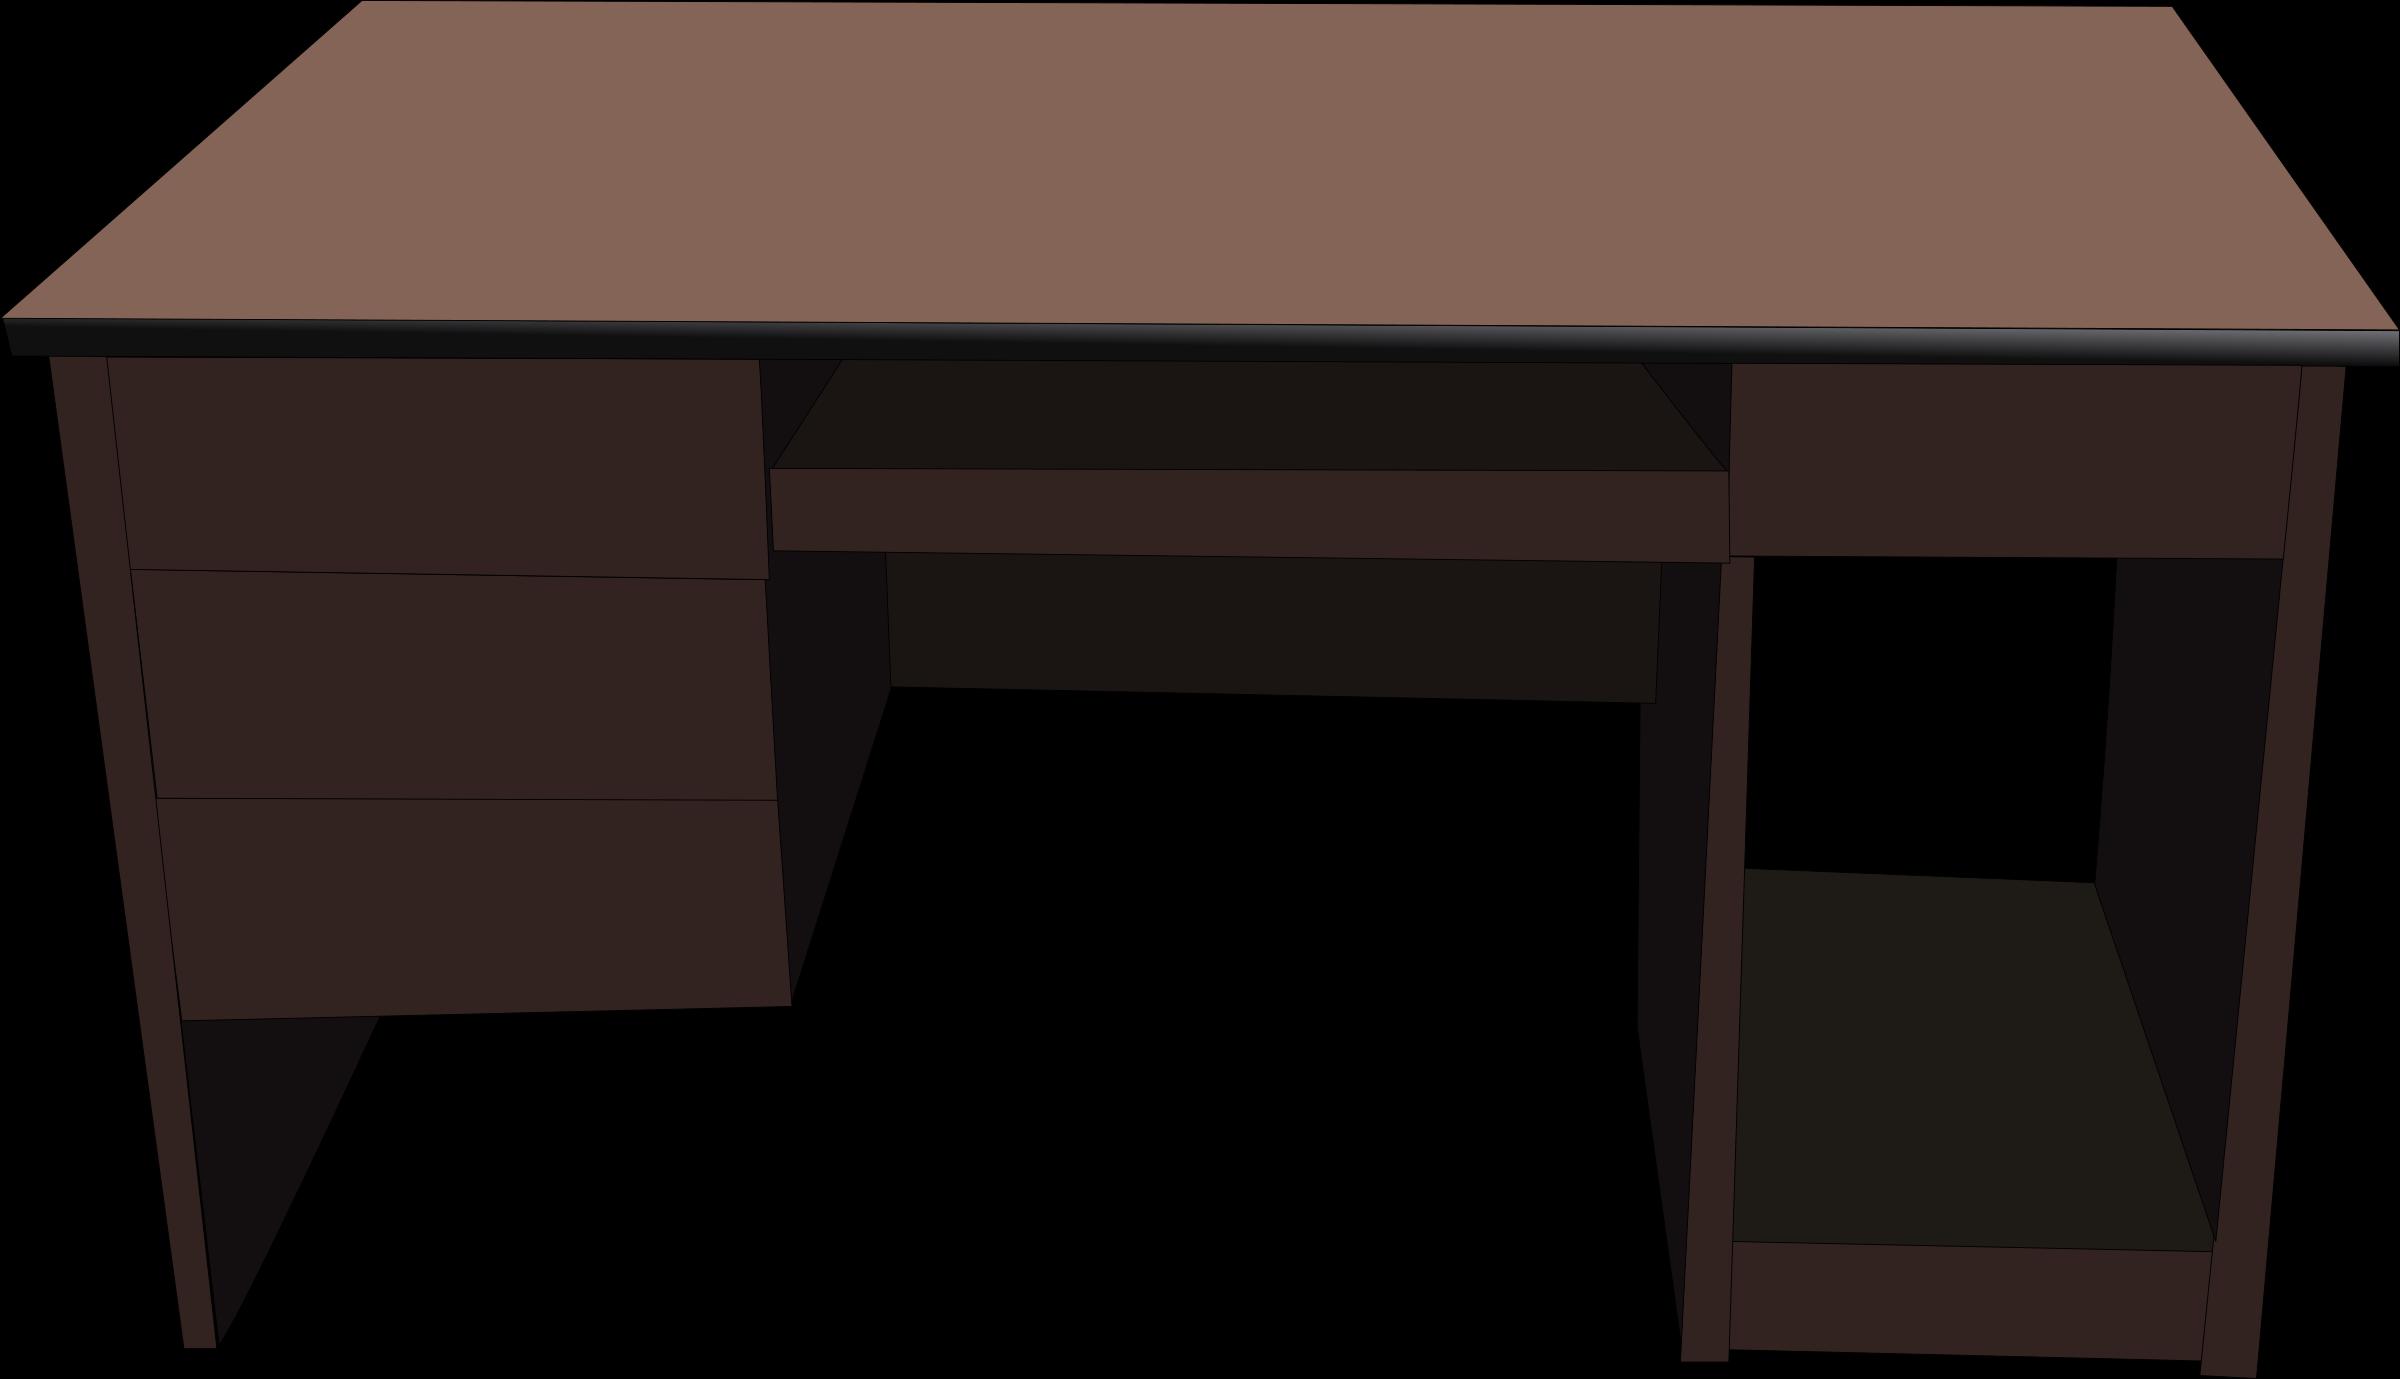 Desk clear desk